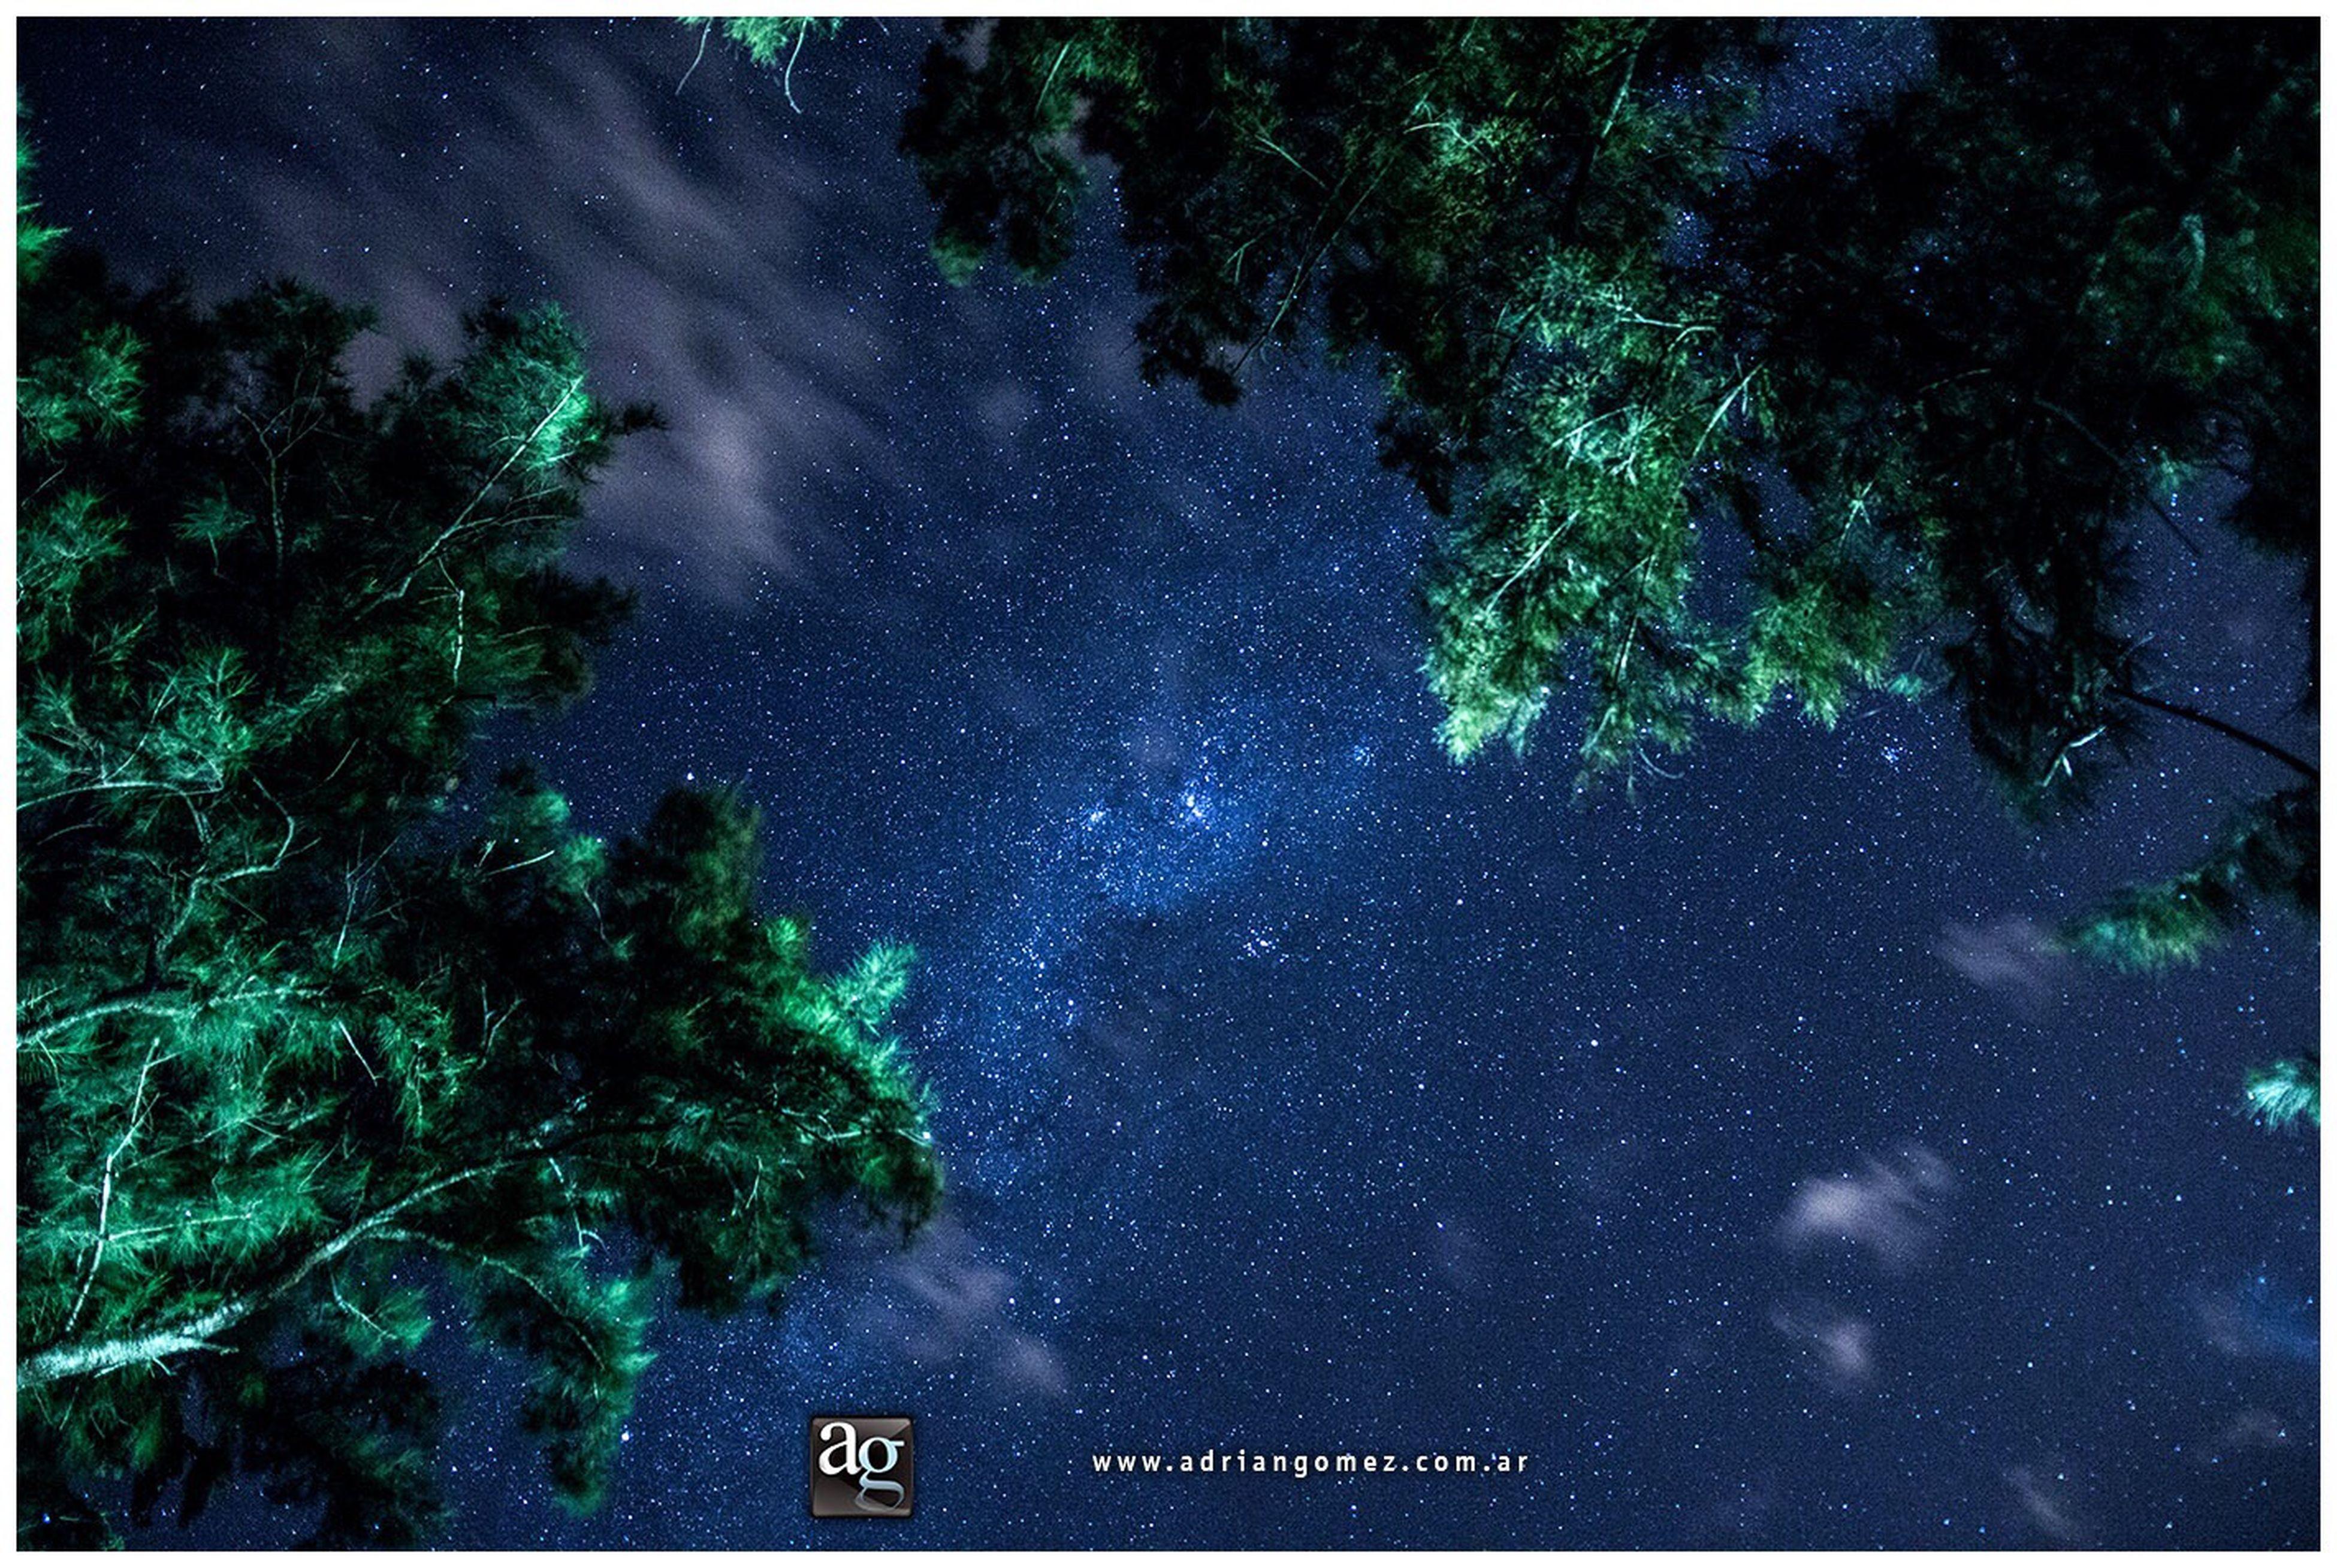 www.adriangomez.com.ar #adriangomezfoto #canon #dreams #photography #art #artwork #artist #photoart #luna #moon #stars #lapicada #entrerios #adrian #gomez #artista #fotografo #nature #vialactea #milkywhite #nigthshot #night #nightstars #star #blackandwhite #lapicada #magicsky Milky Way Star - Space Galaxy Tree Astronomy Beauty In Nature Nature No People Space Sky Outdoors Night First Eyeem Photo